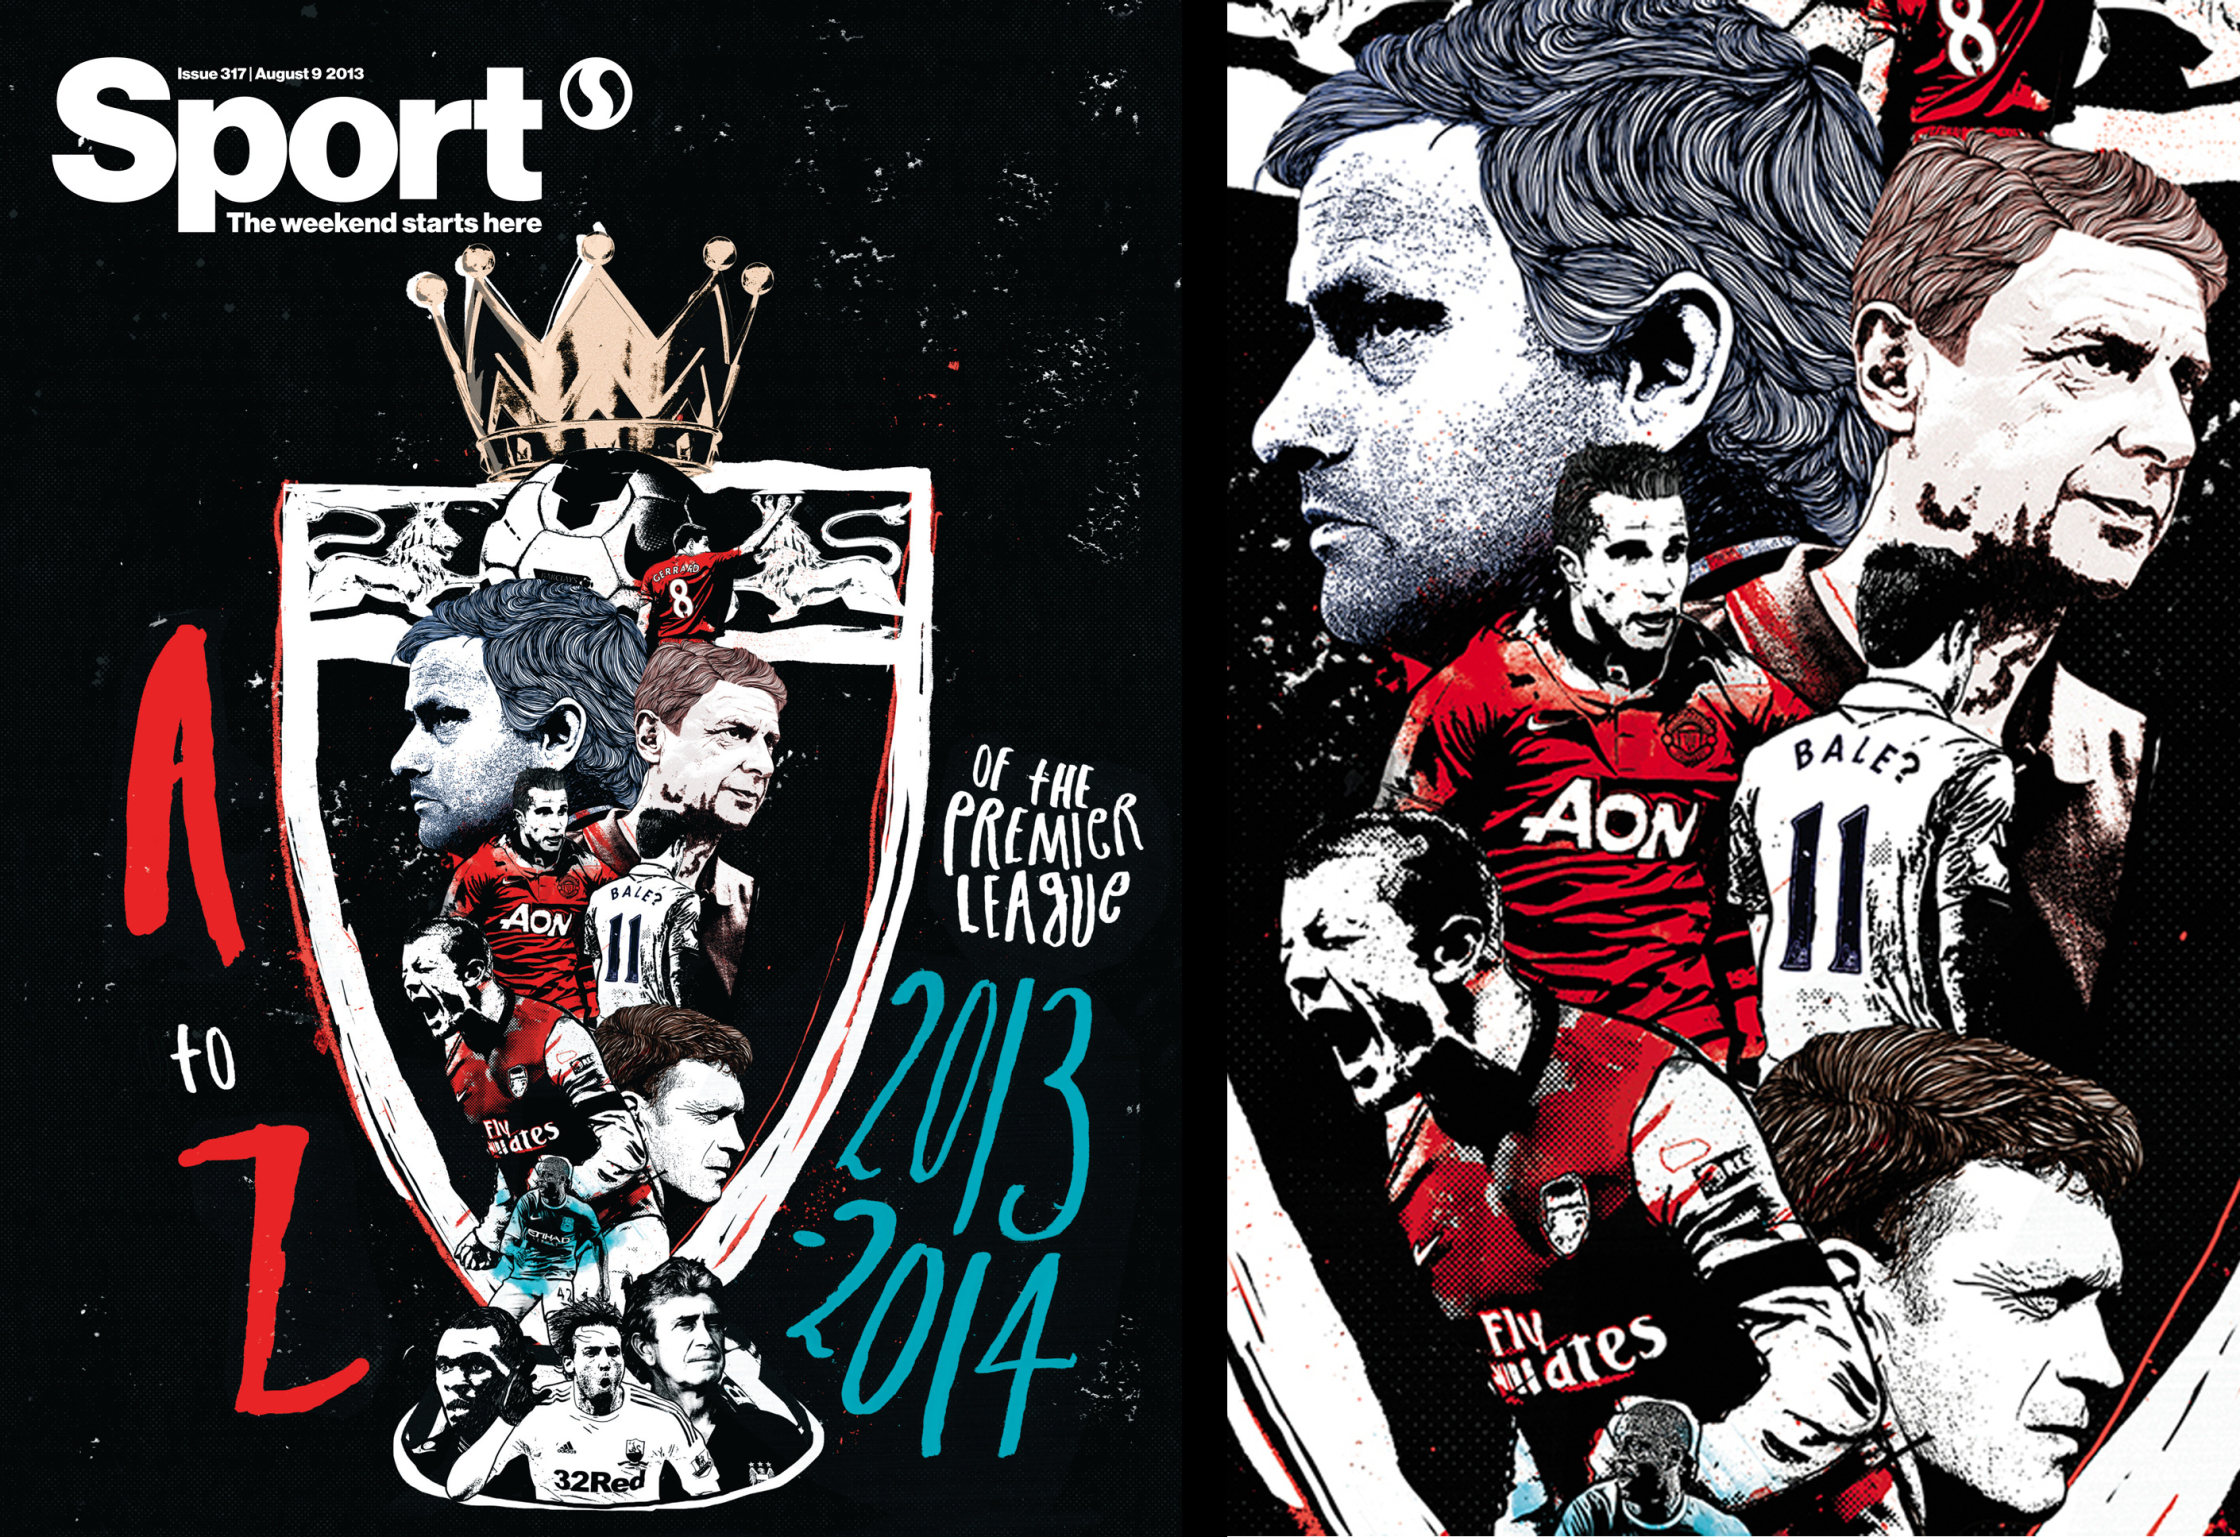 A to Z of the Premier League / Sport Magazine